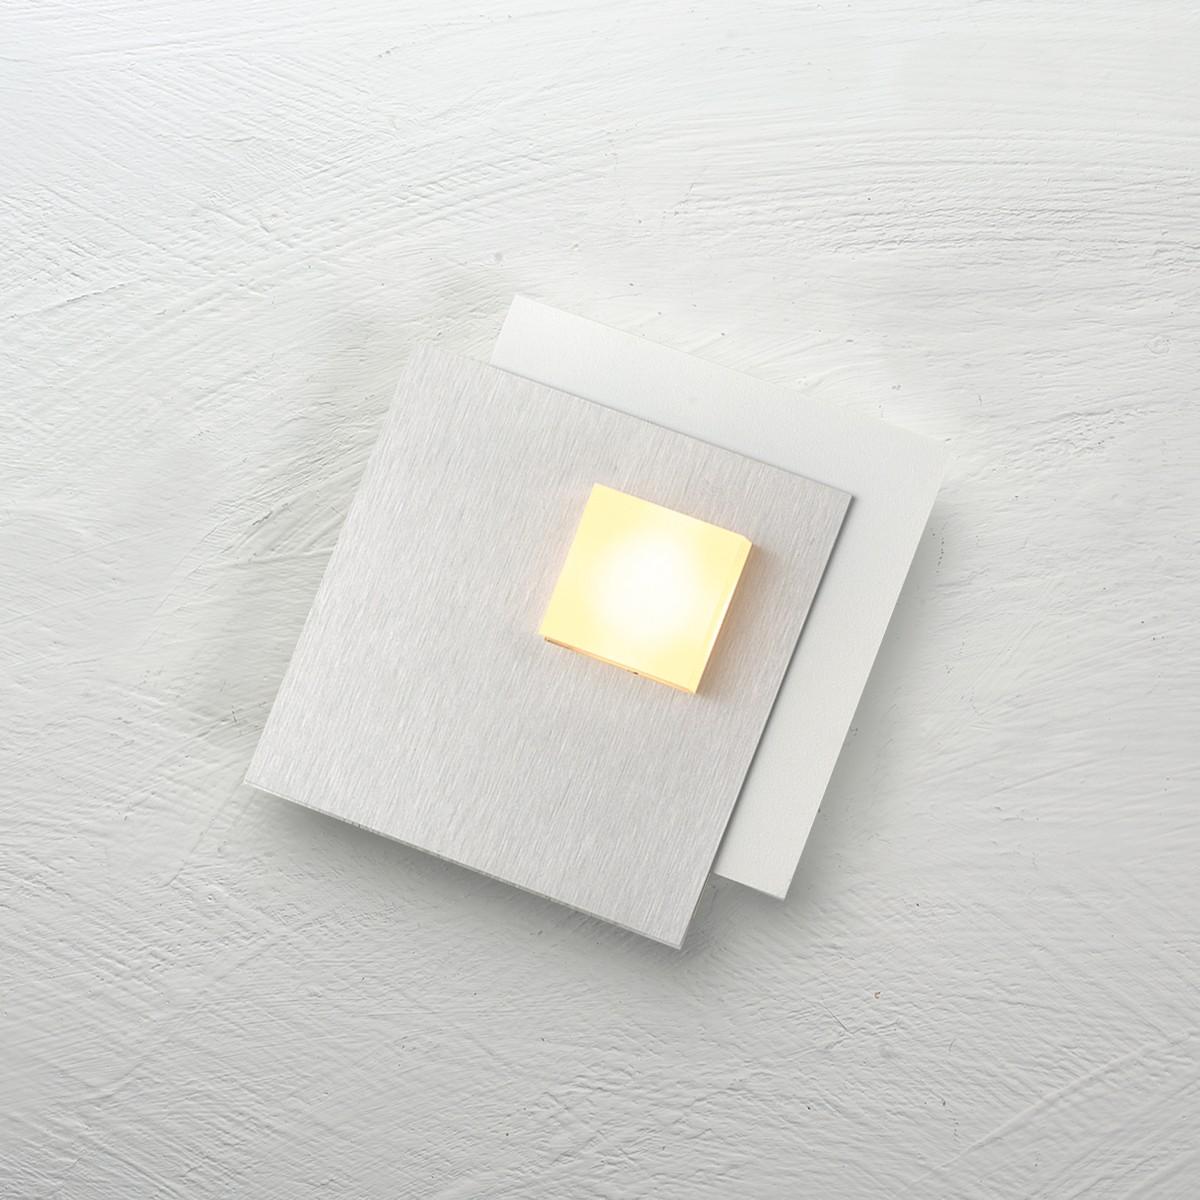 Bopp Pixel 2.0 LED Deckenleuchte 1-flg., weiß, Dekoplatte: Aluminium